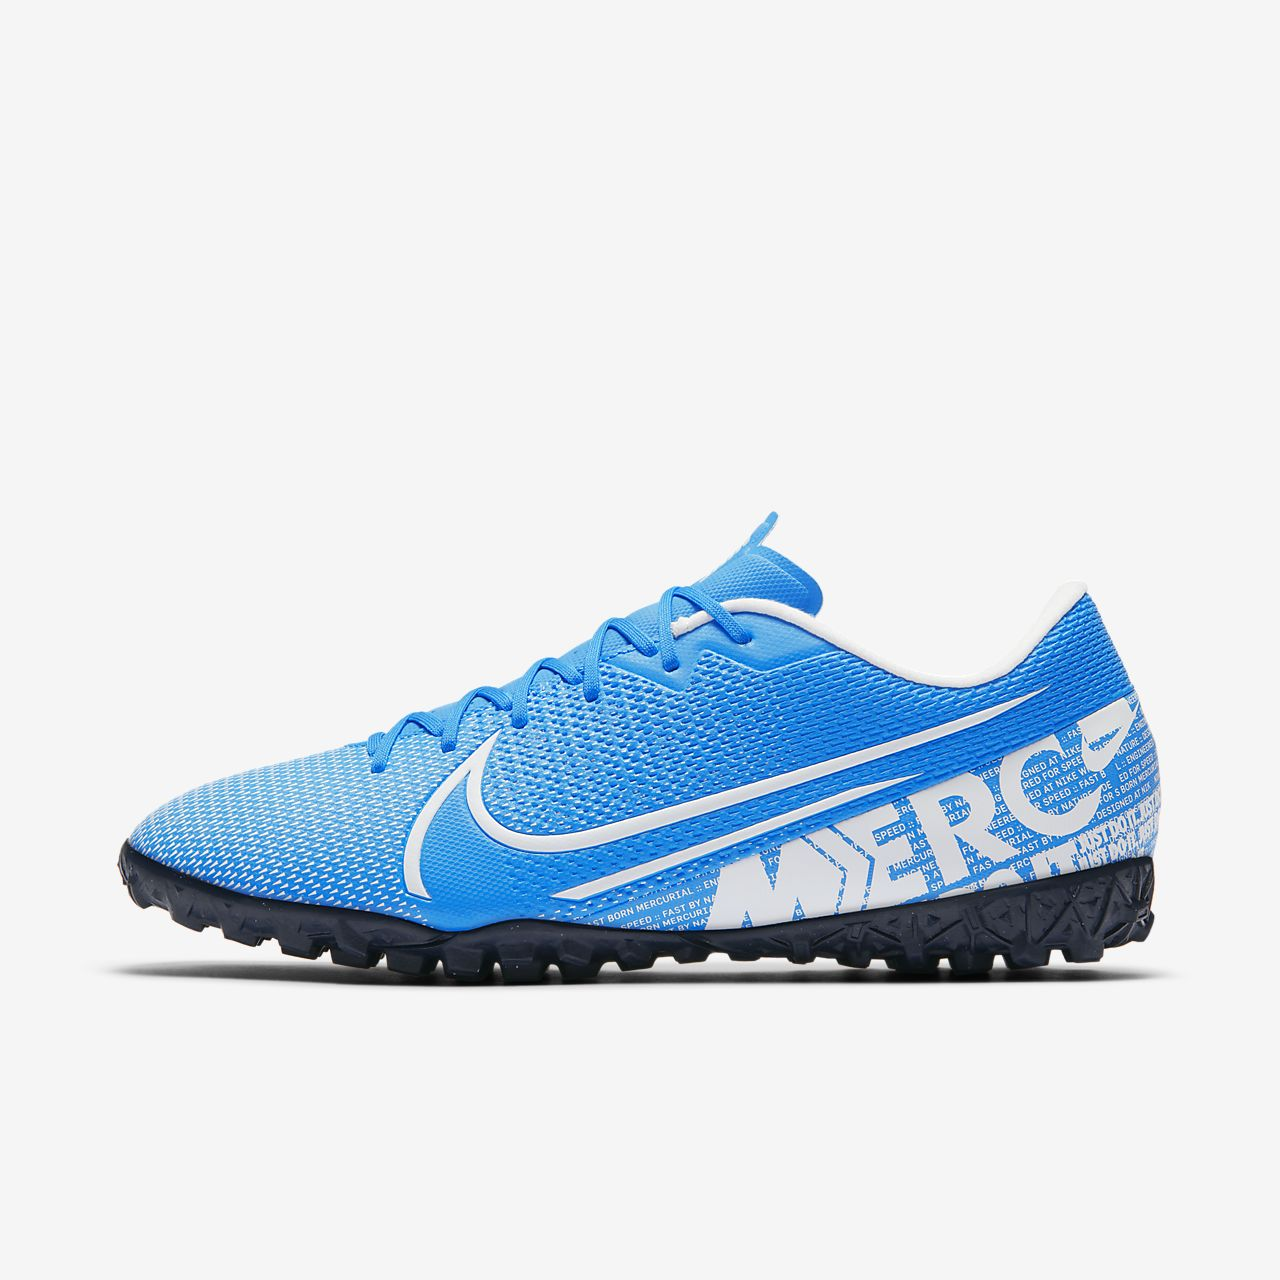 Kopačka Nike Mercurial Vapor 13 Academy TF na umělou trávu